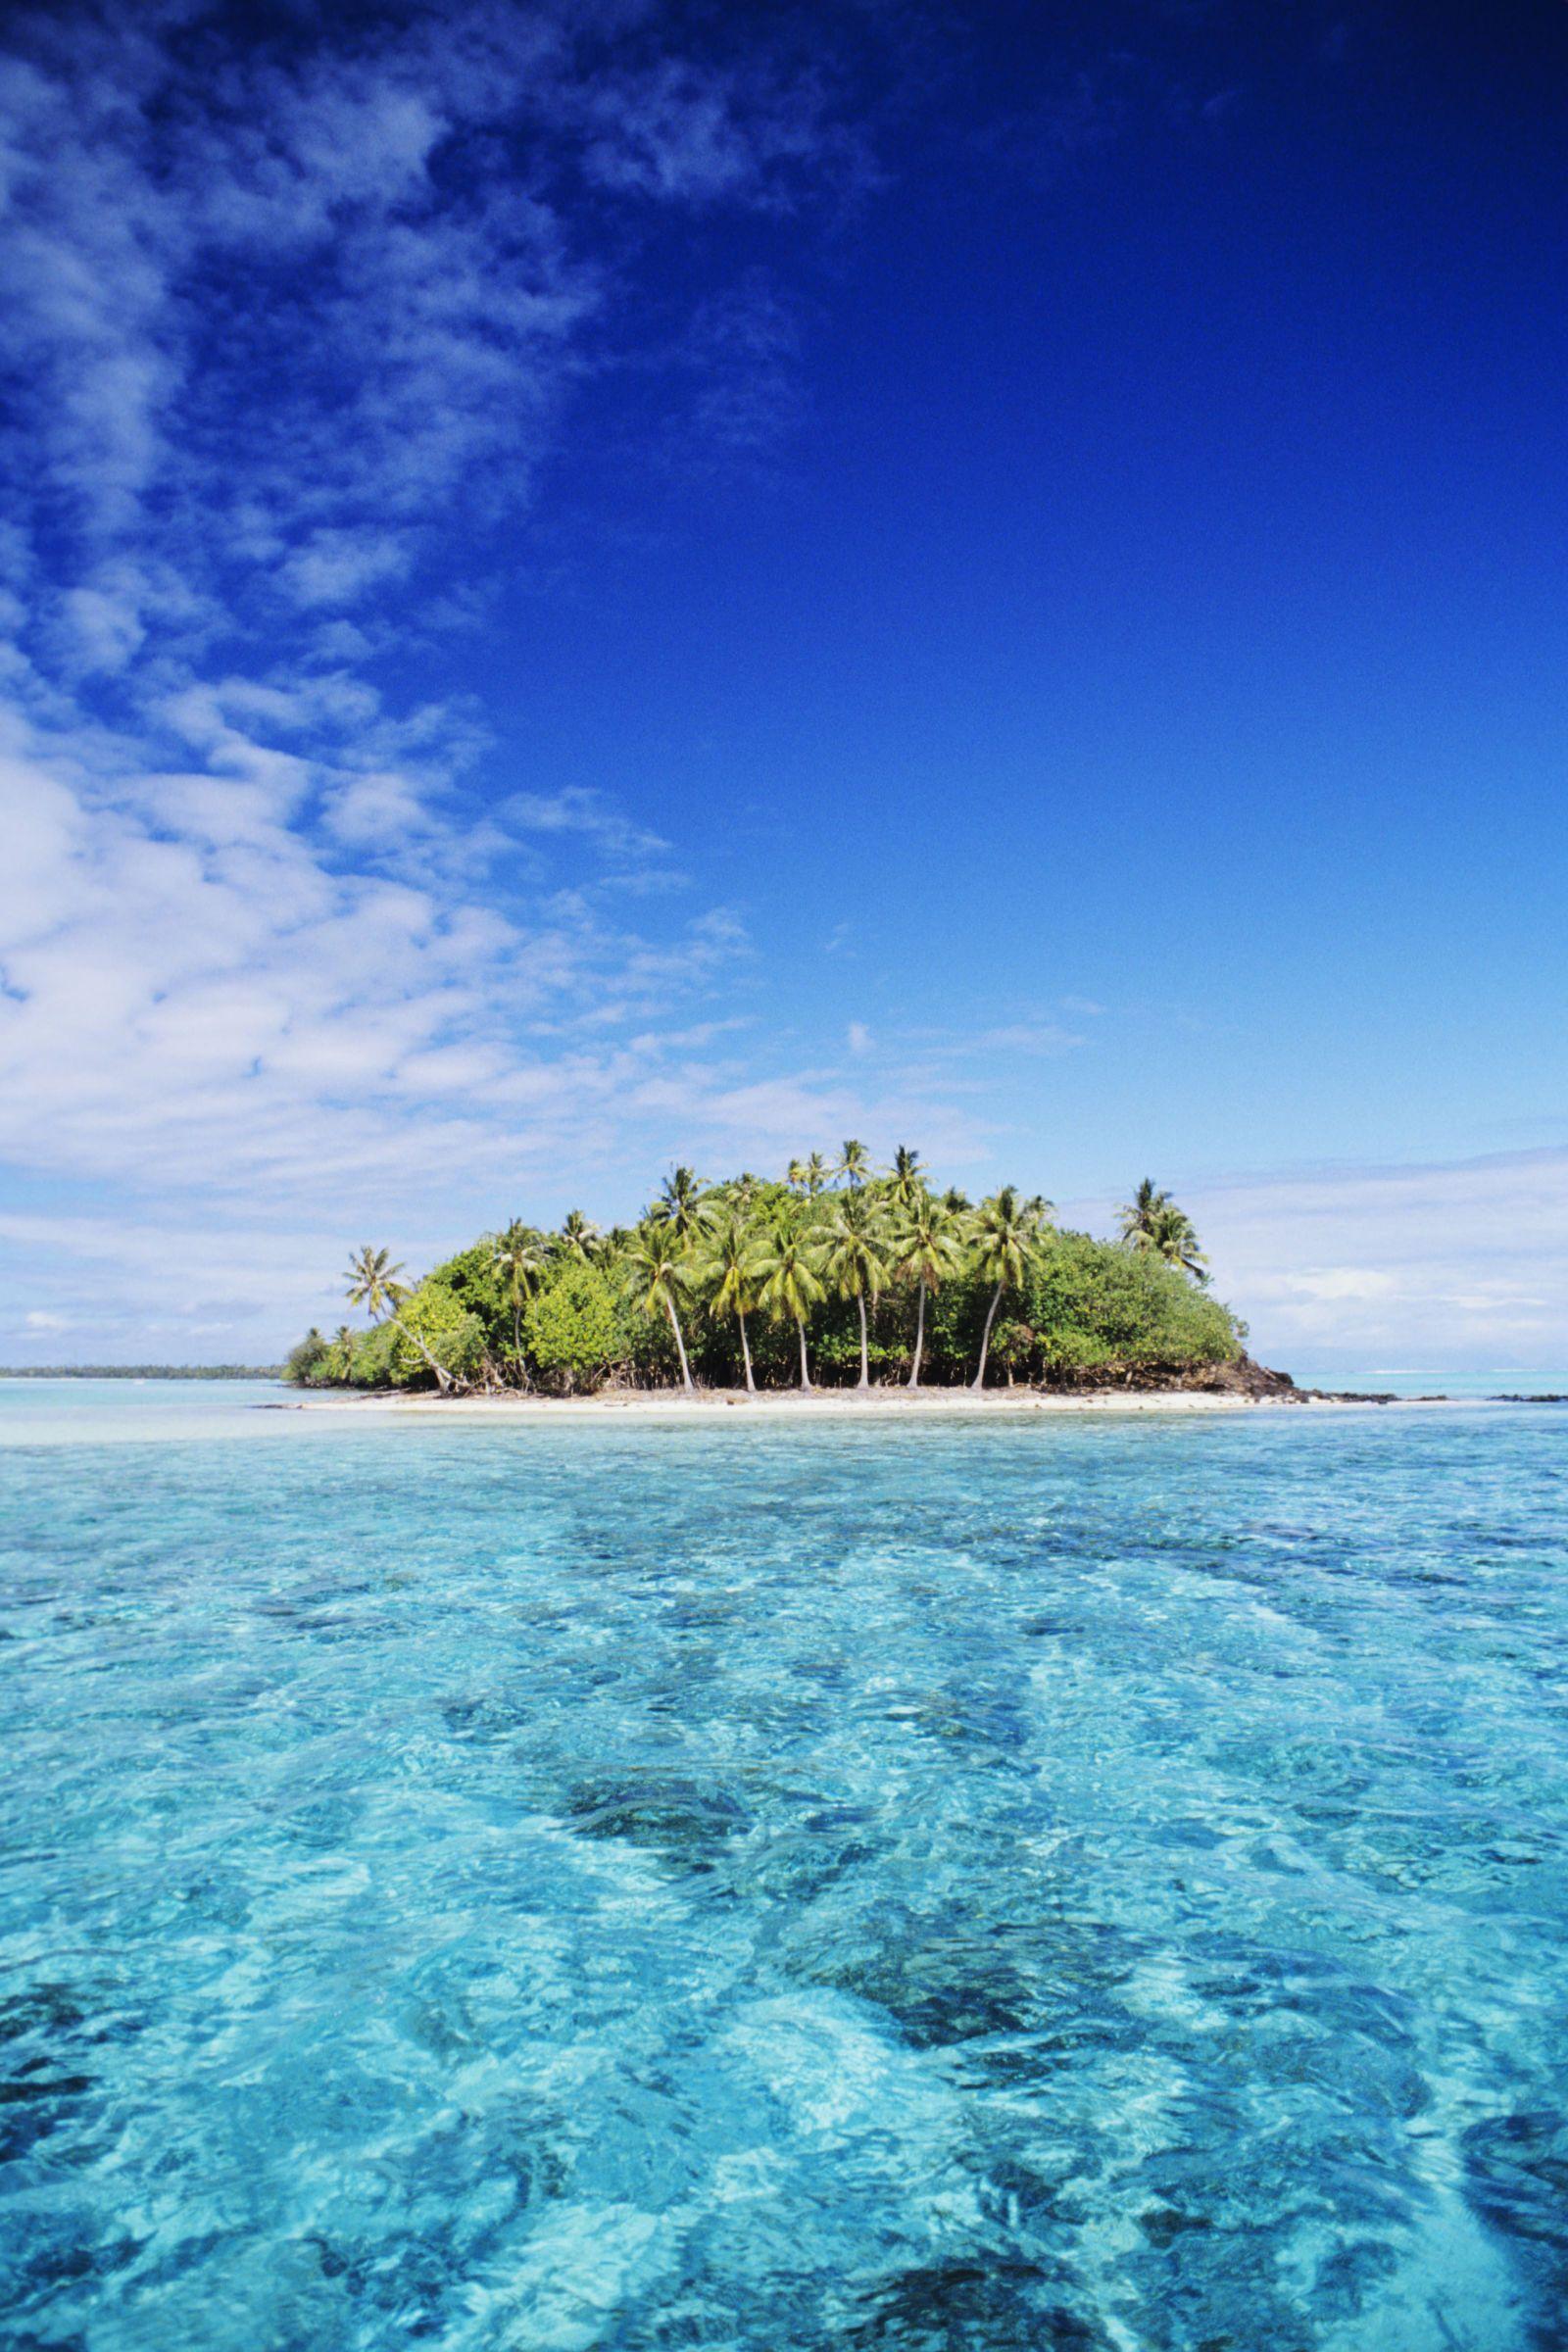 20 Most Romantic Honeymoon Destinations: The 20 Most Inspiring Honeymoon Destinations